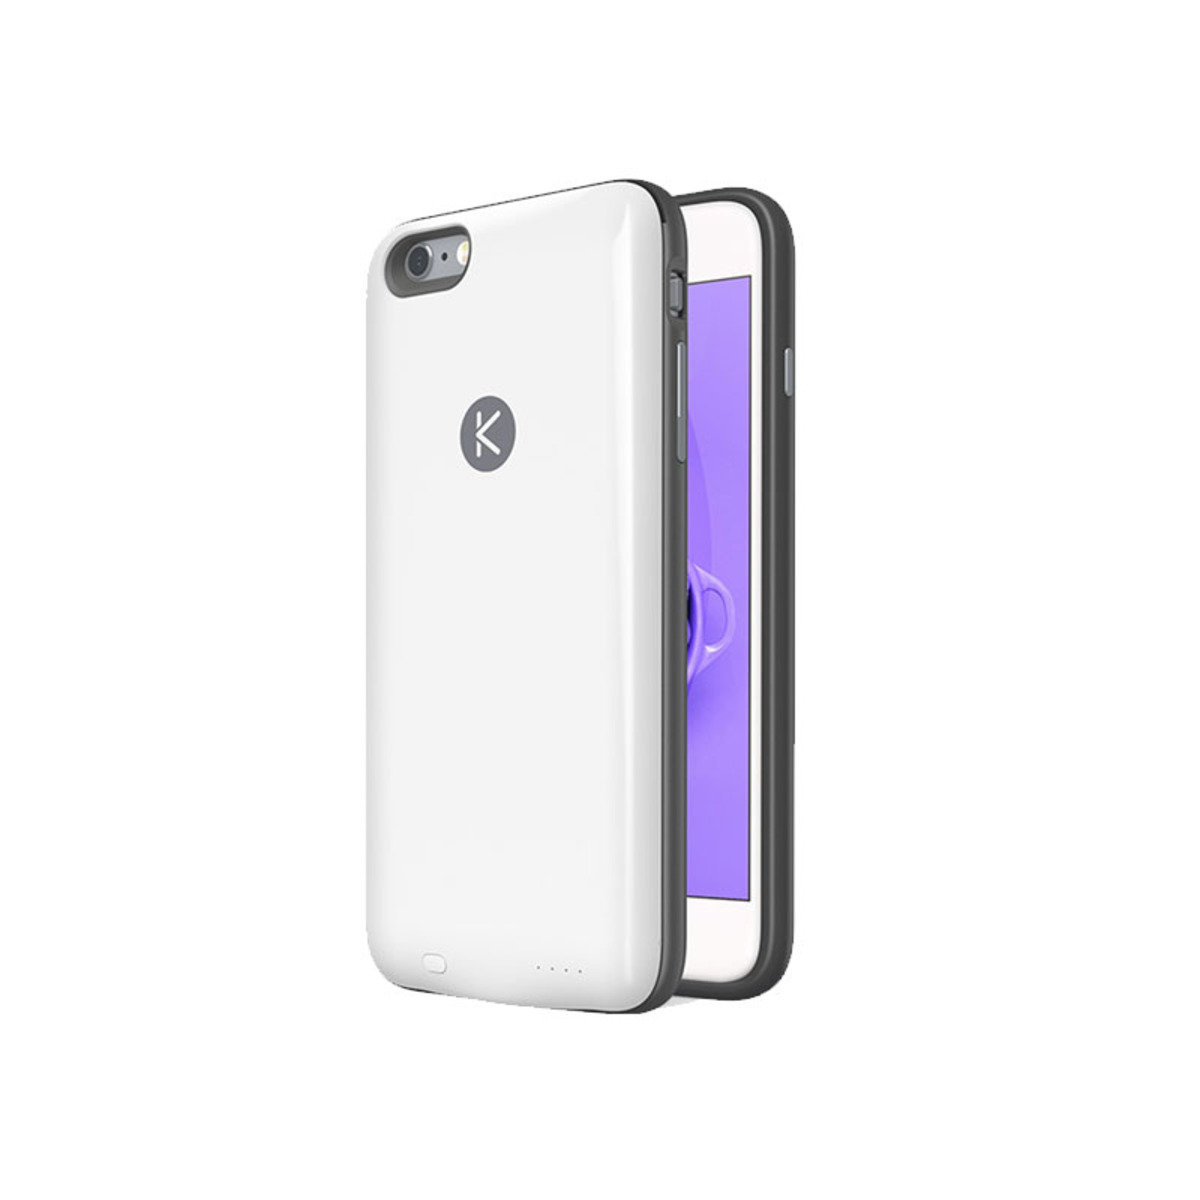 iPhone 6 Plus/ 6S Plus 專用機殼連2400mAh充電池 黑色+白色